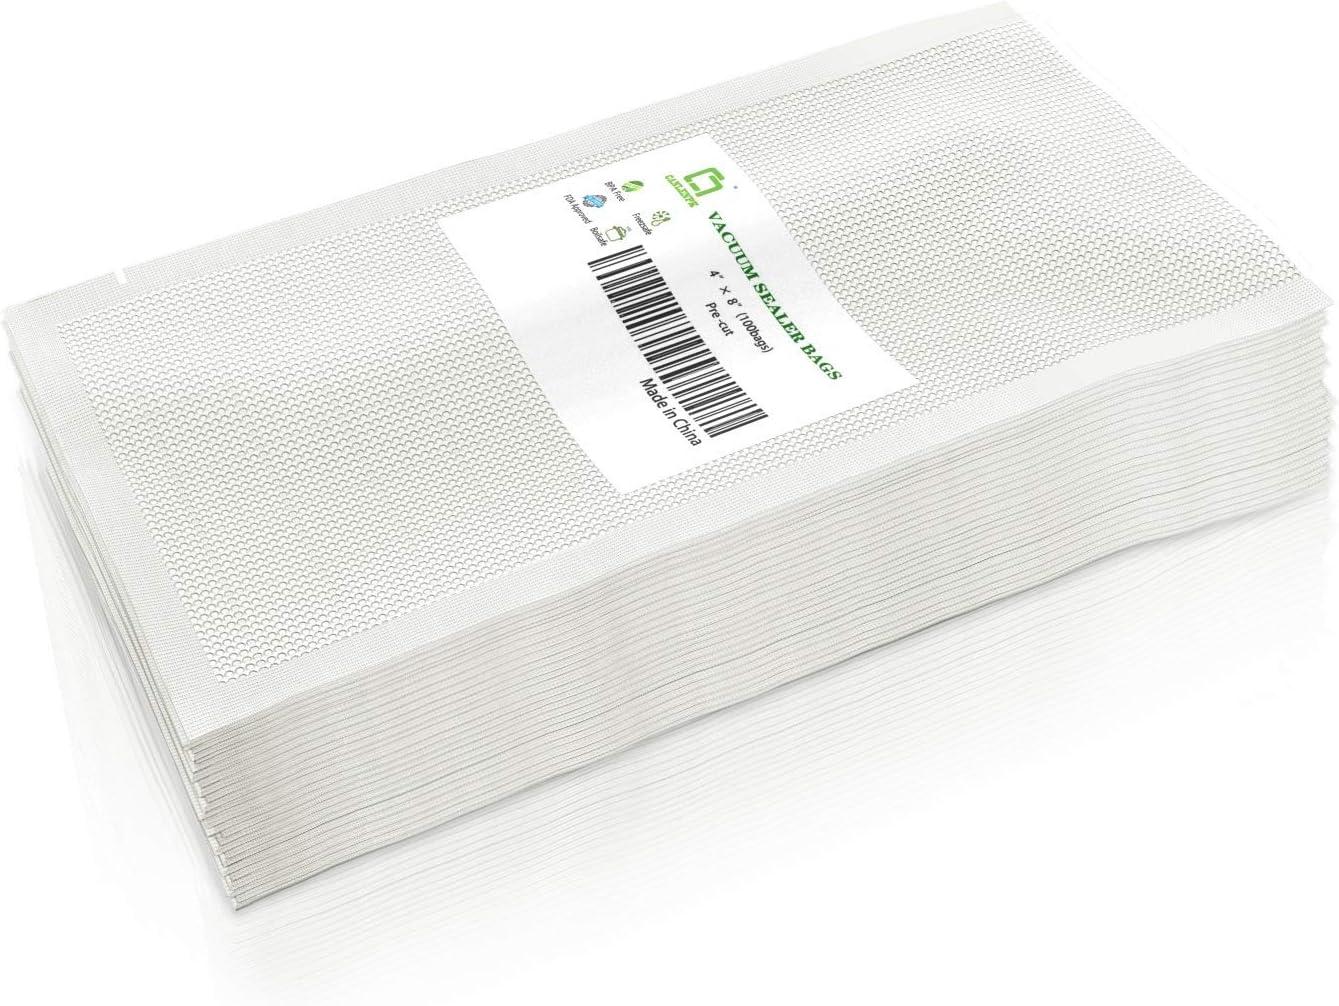 CANLENPK 4×8 Inch Vacuum Seal Bags,Small Precut Food Storage Sealer Bag,Seal Meal Snack Fruit Nut Tea Cookie Bean ,Boil Steam Heat Freezer Sous Vide Grocery Sealable Bag,Commercial Grade Heavy Duty(100PCS)